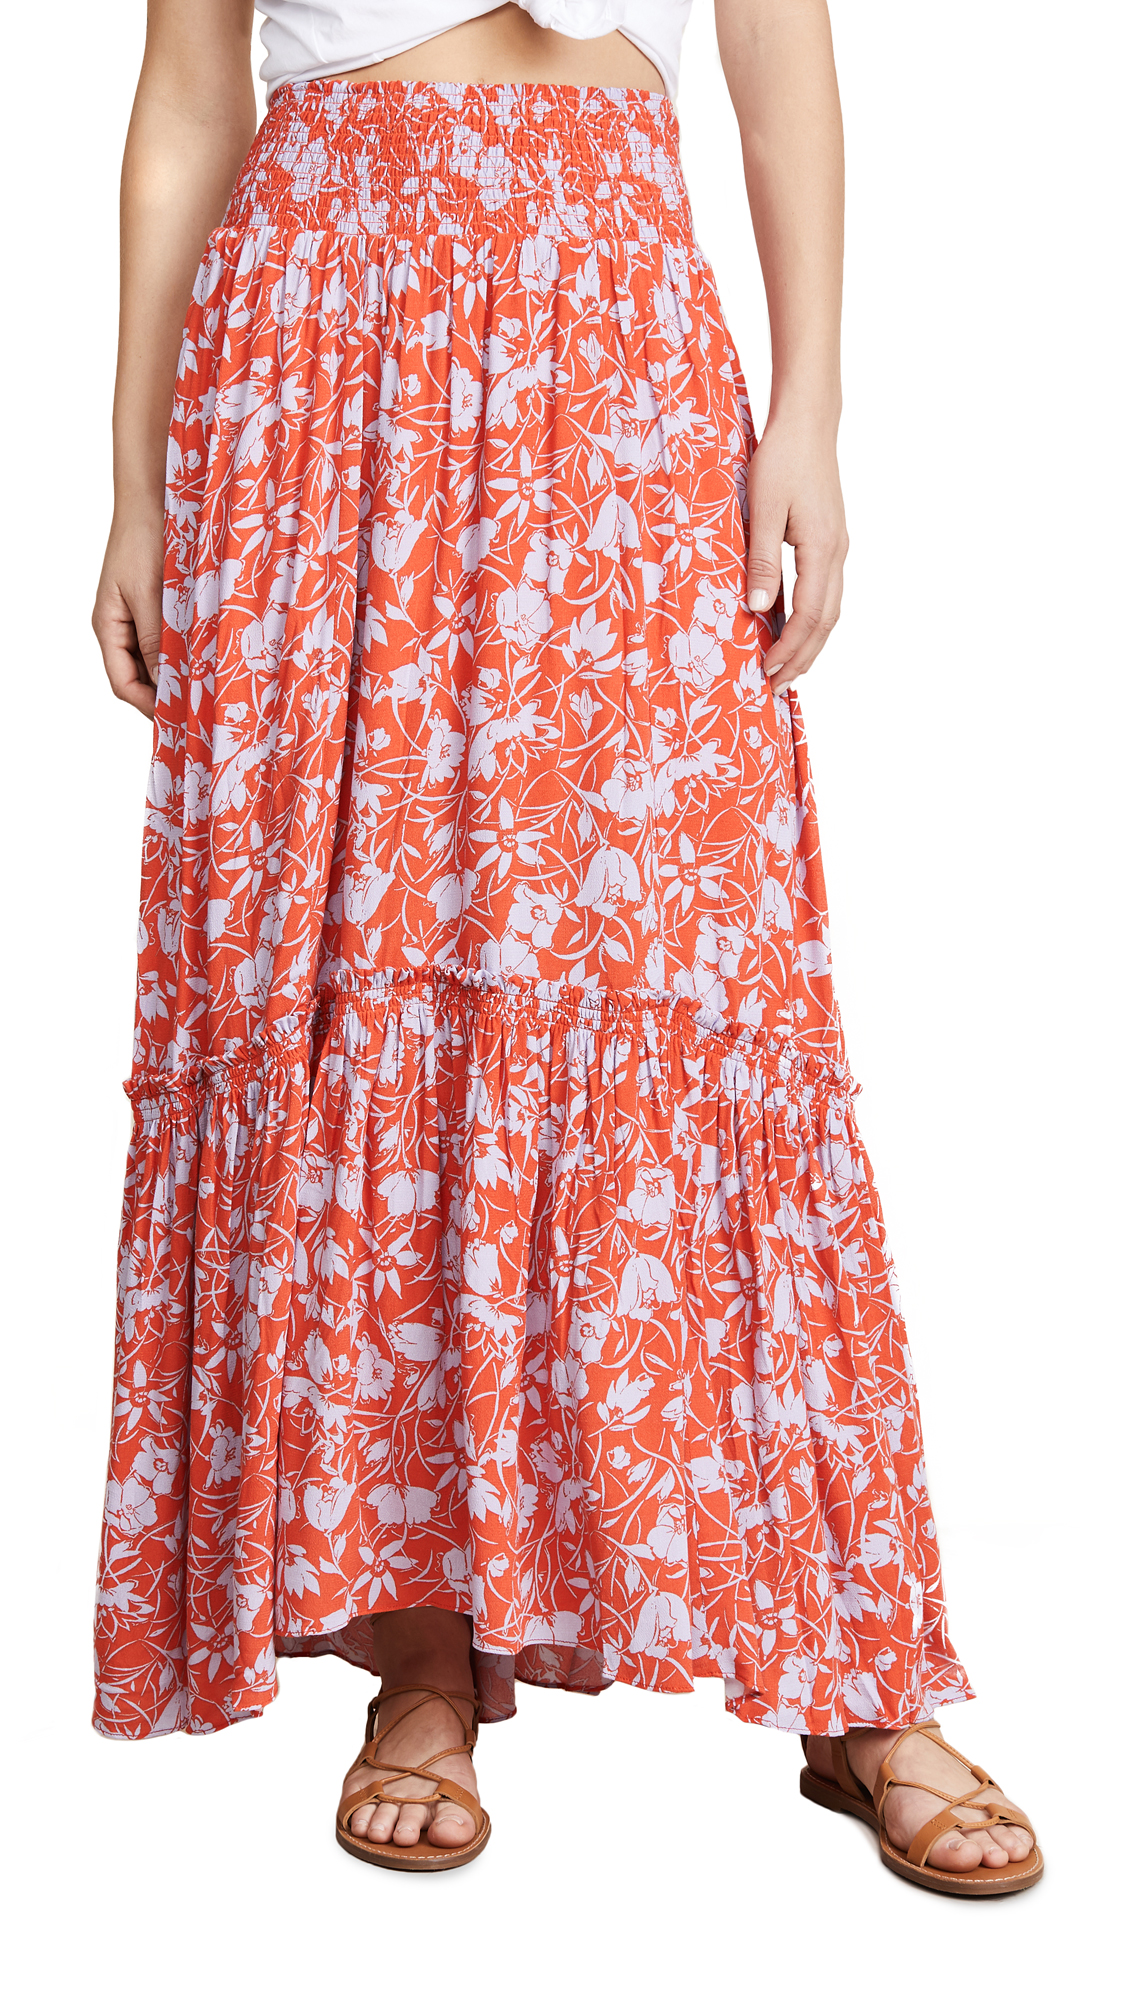 bce77eb55 Free People Way of the Wind Printed Midi Skirt | SHOPBOP